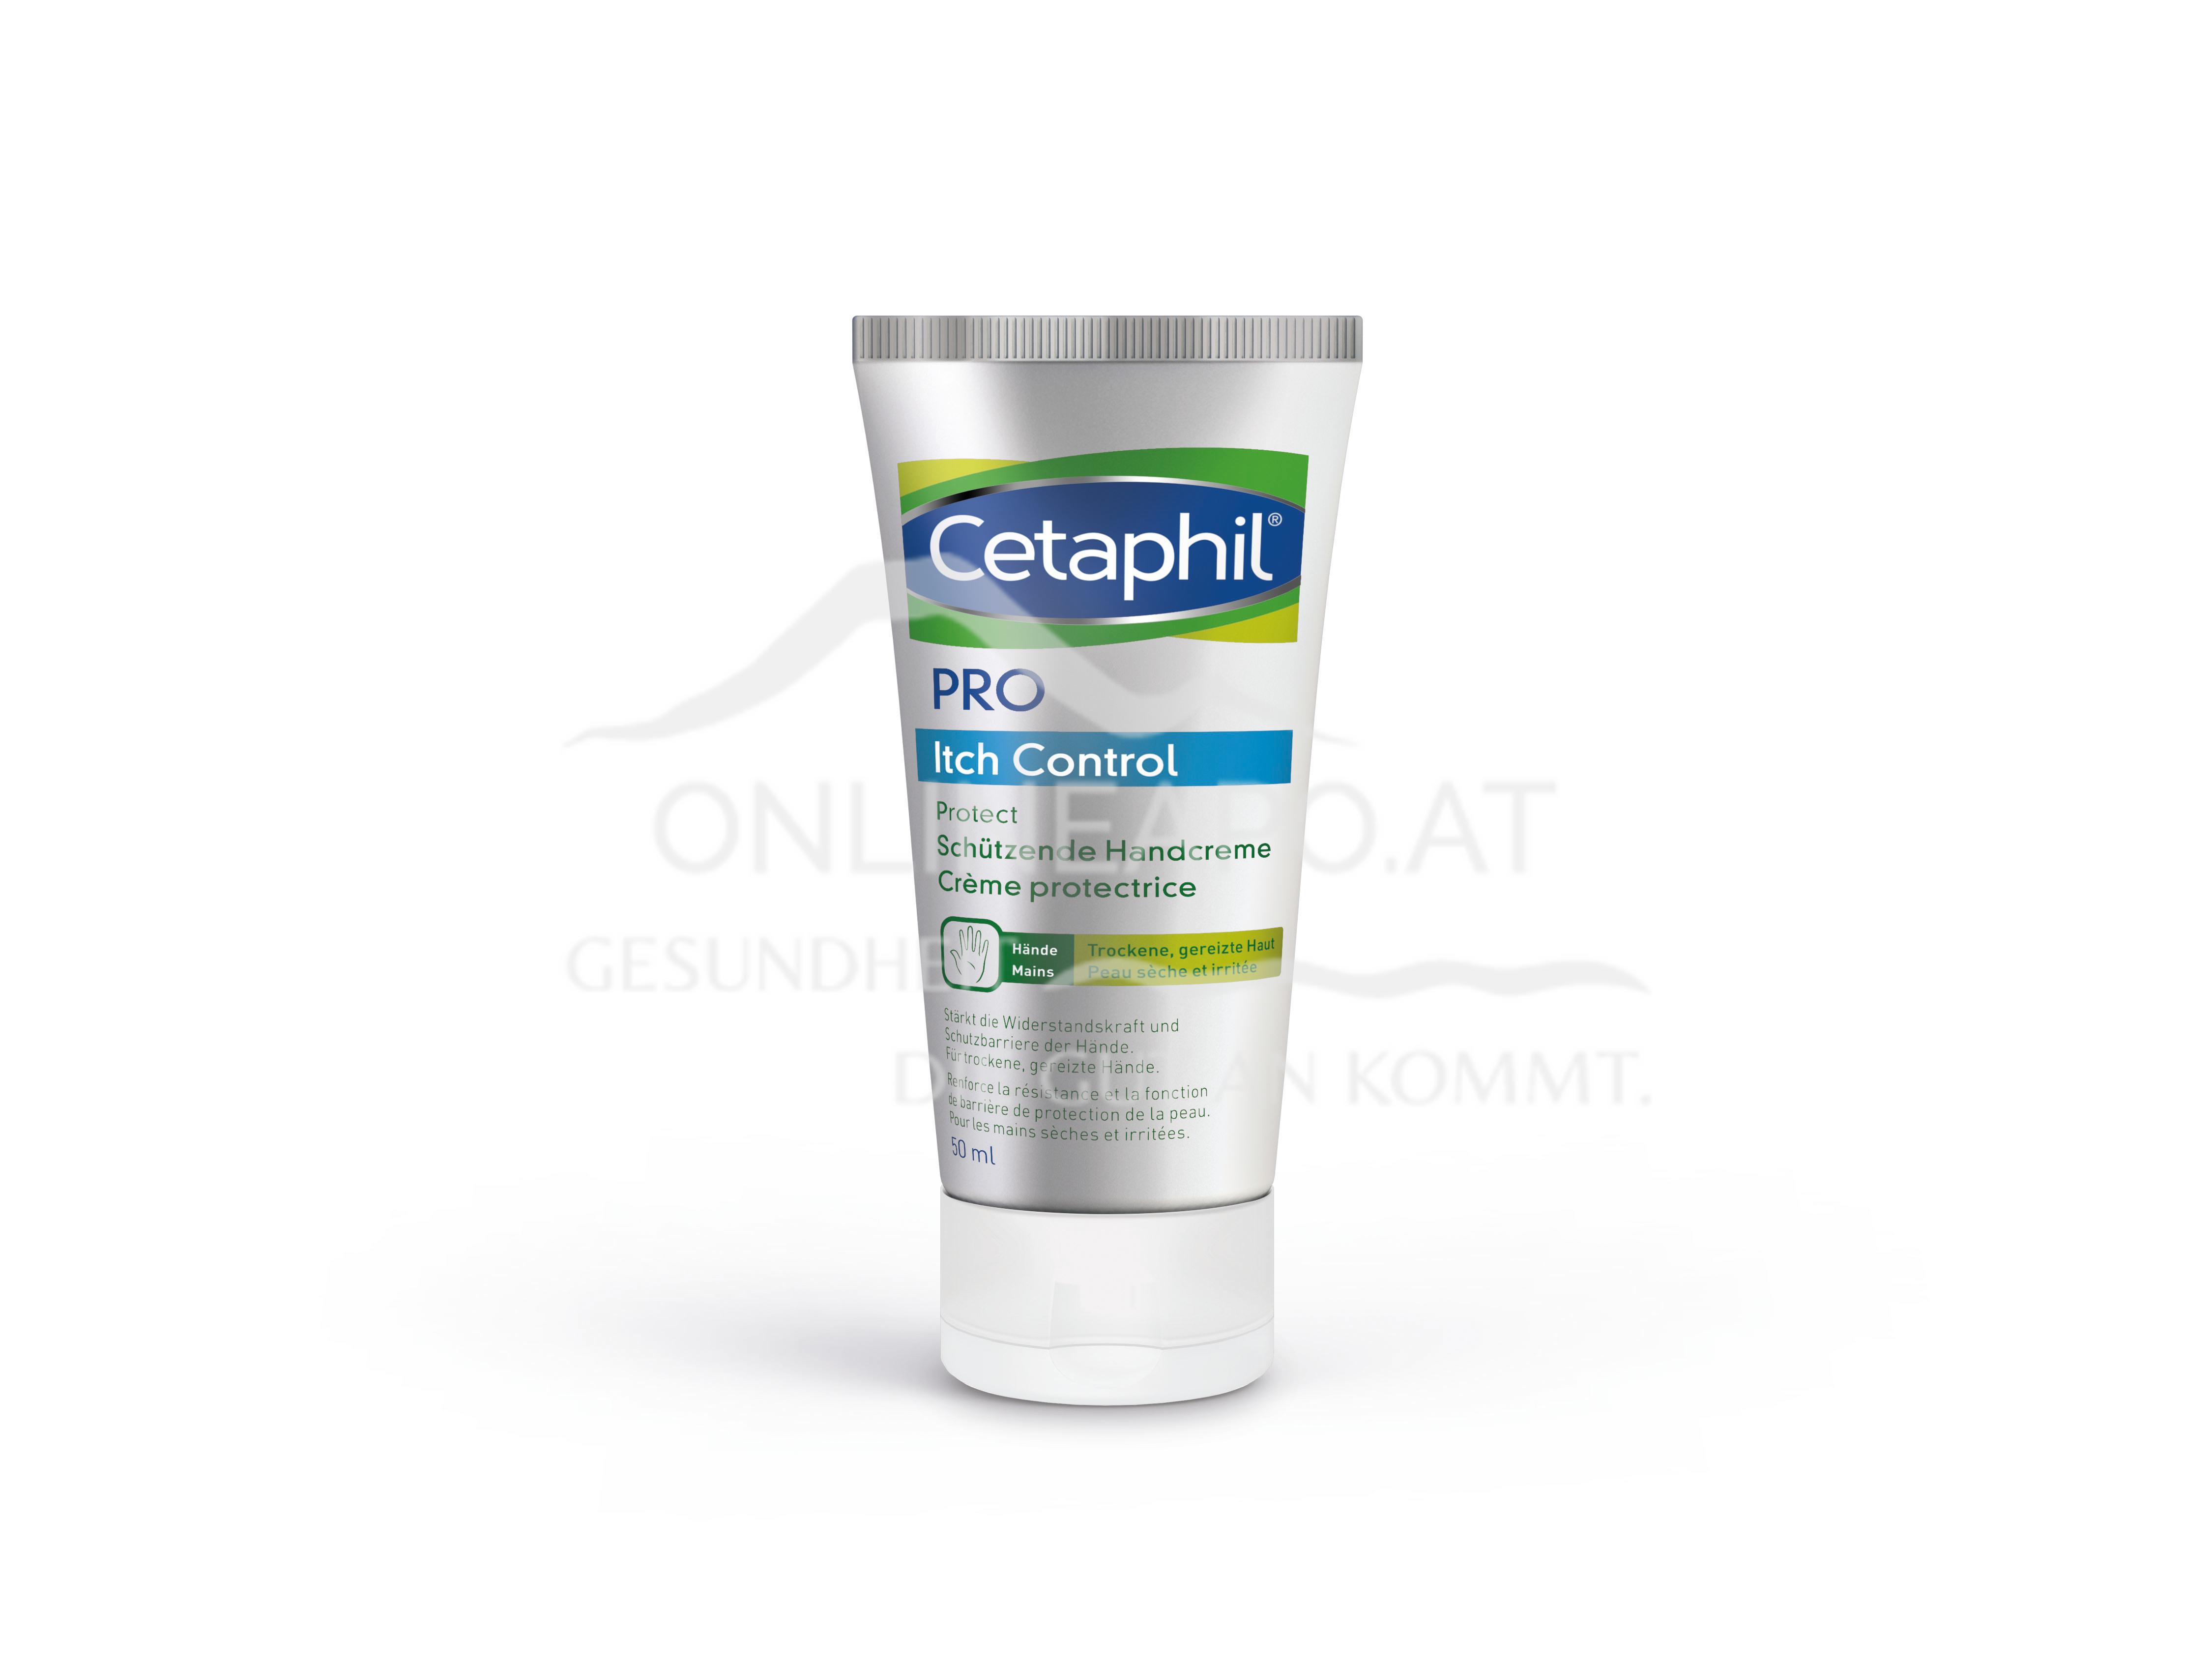 Cetaphil® PRO ItchControl Protect schützende Handcreme